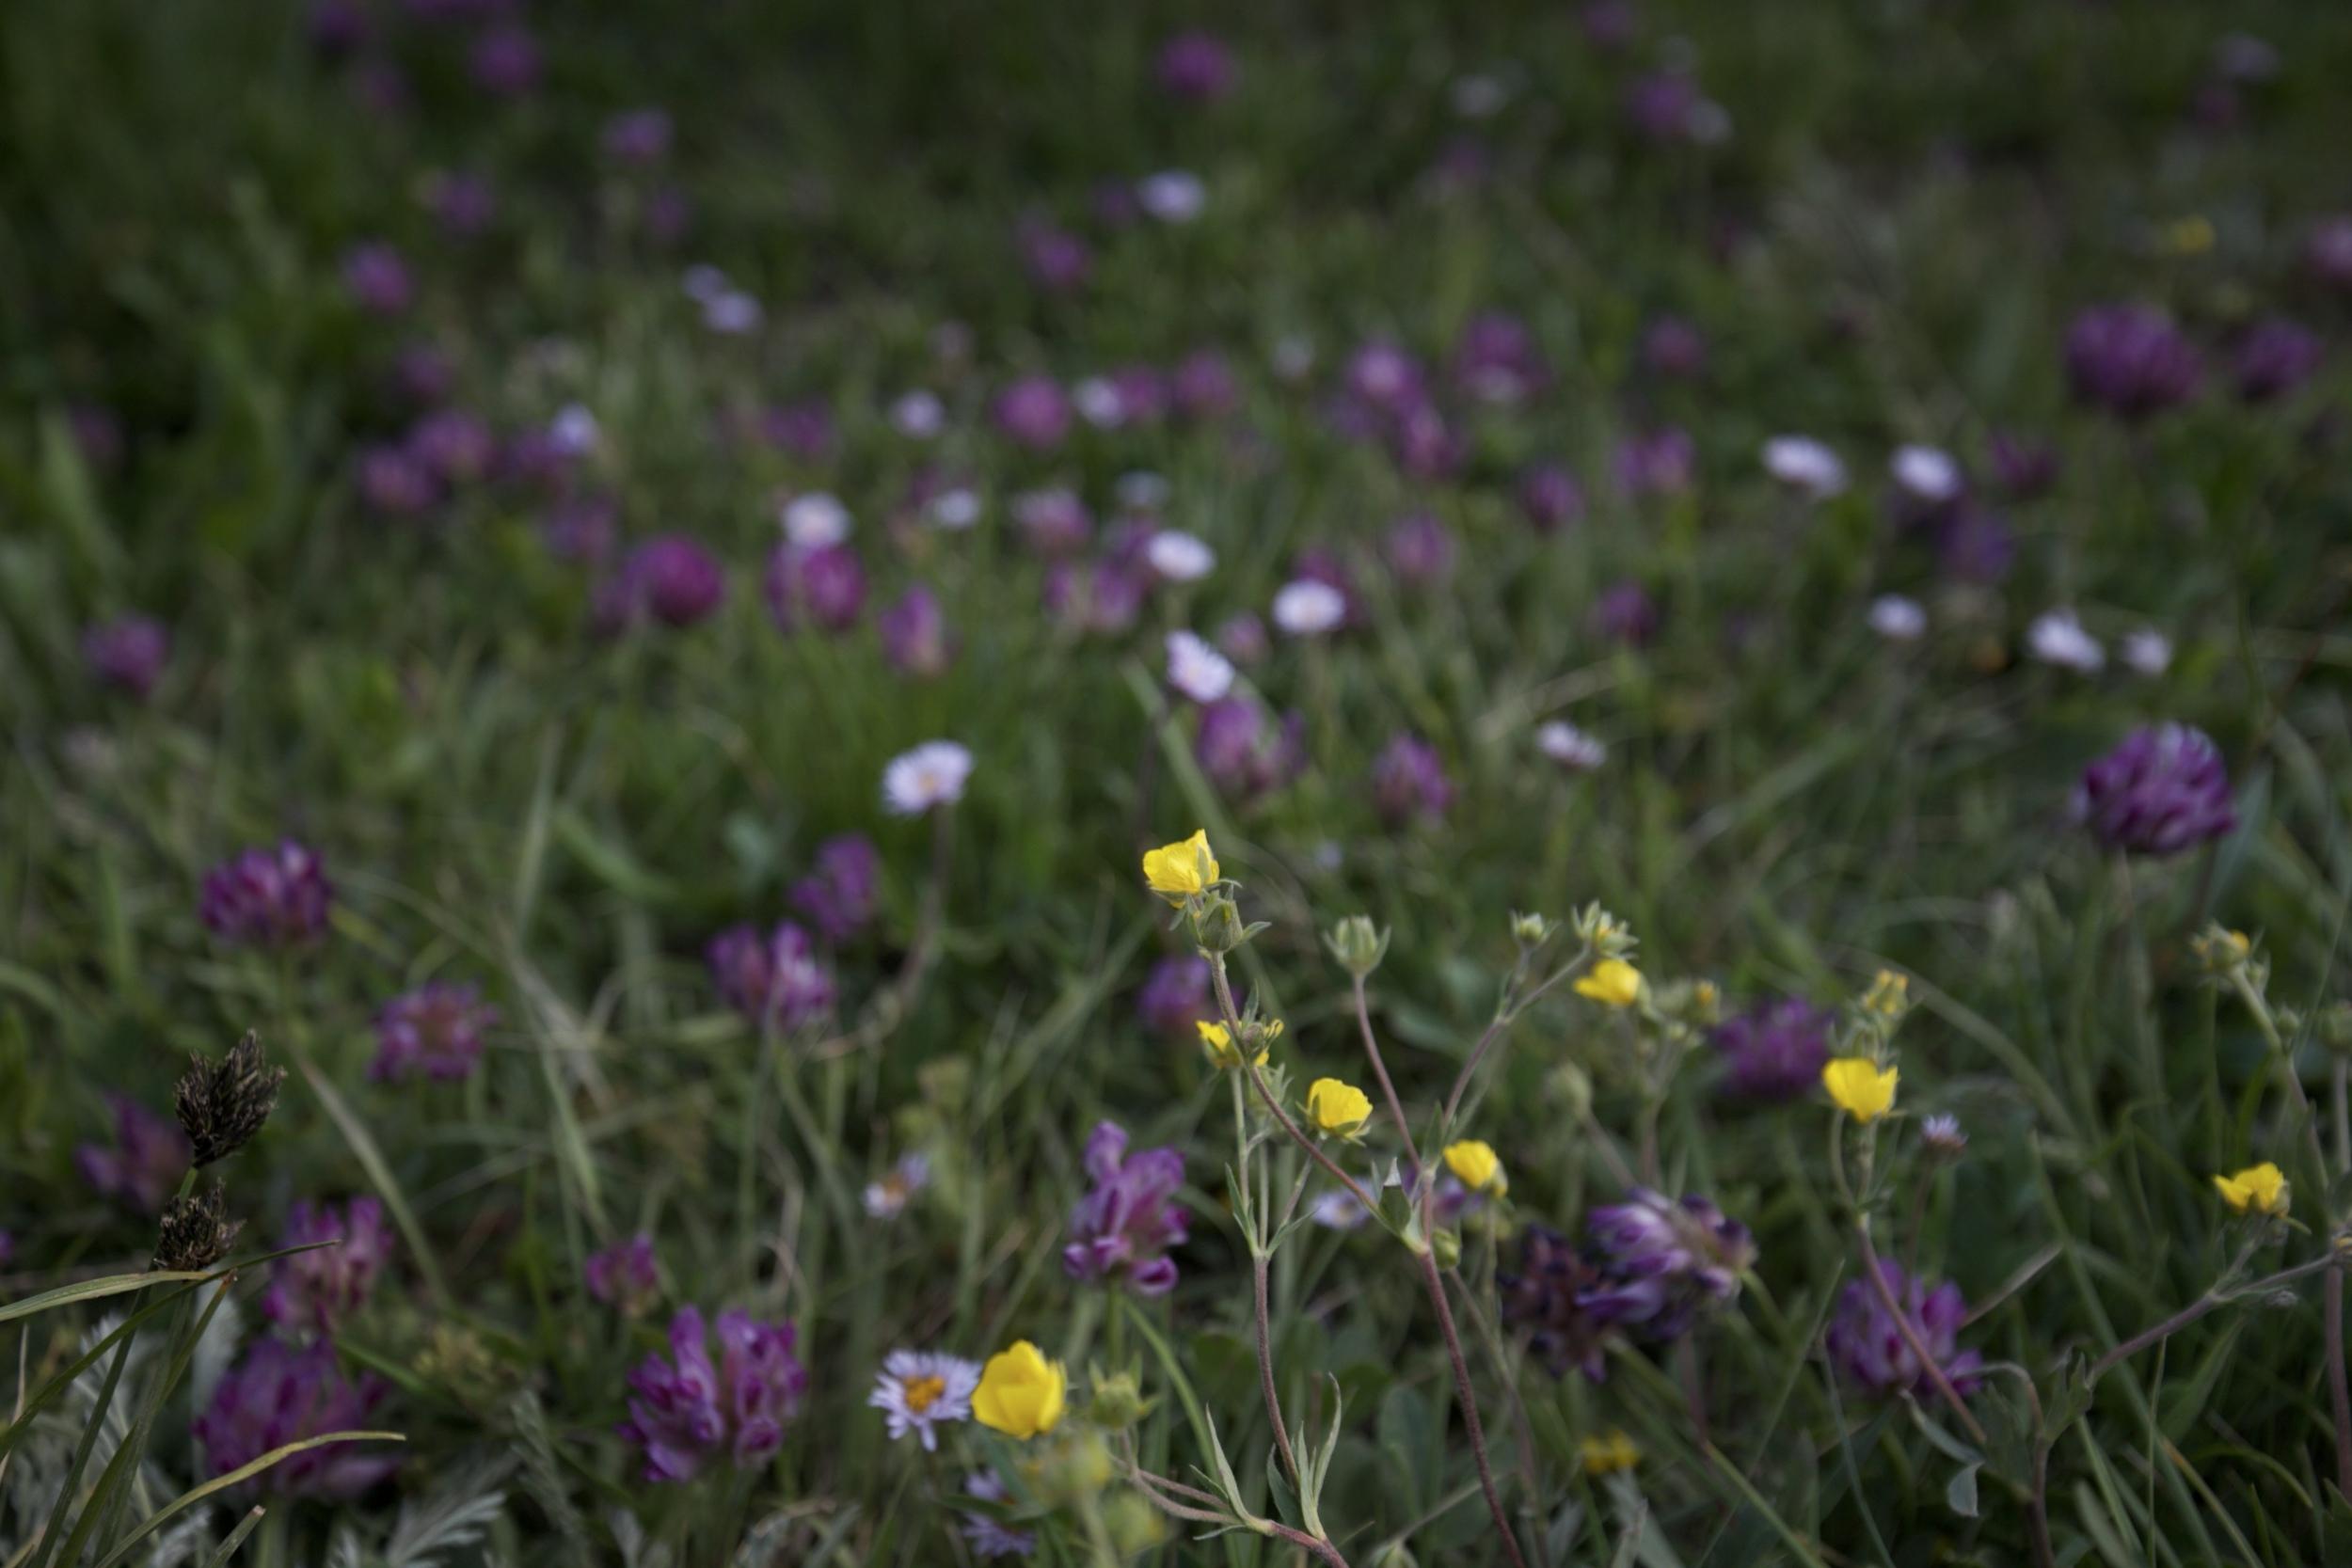 Wild clover and alpine buttercups